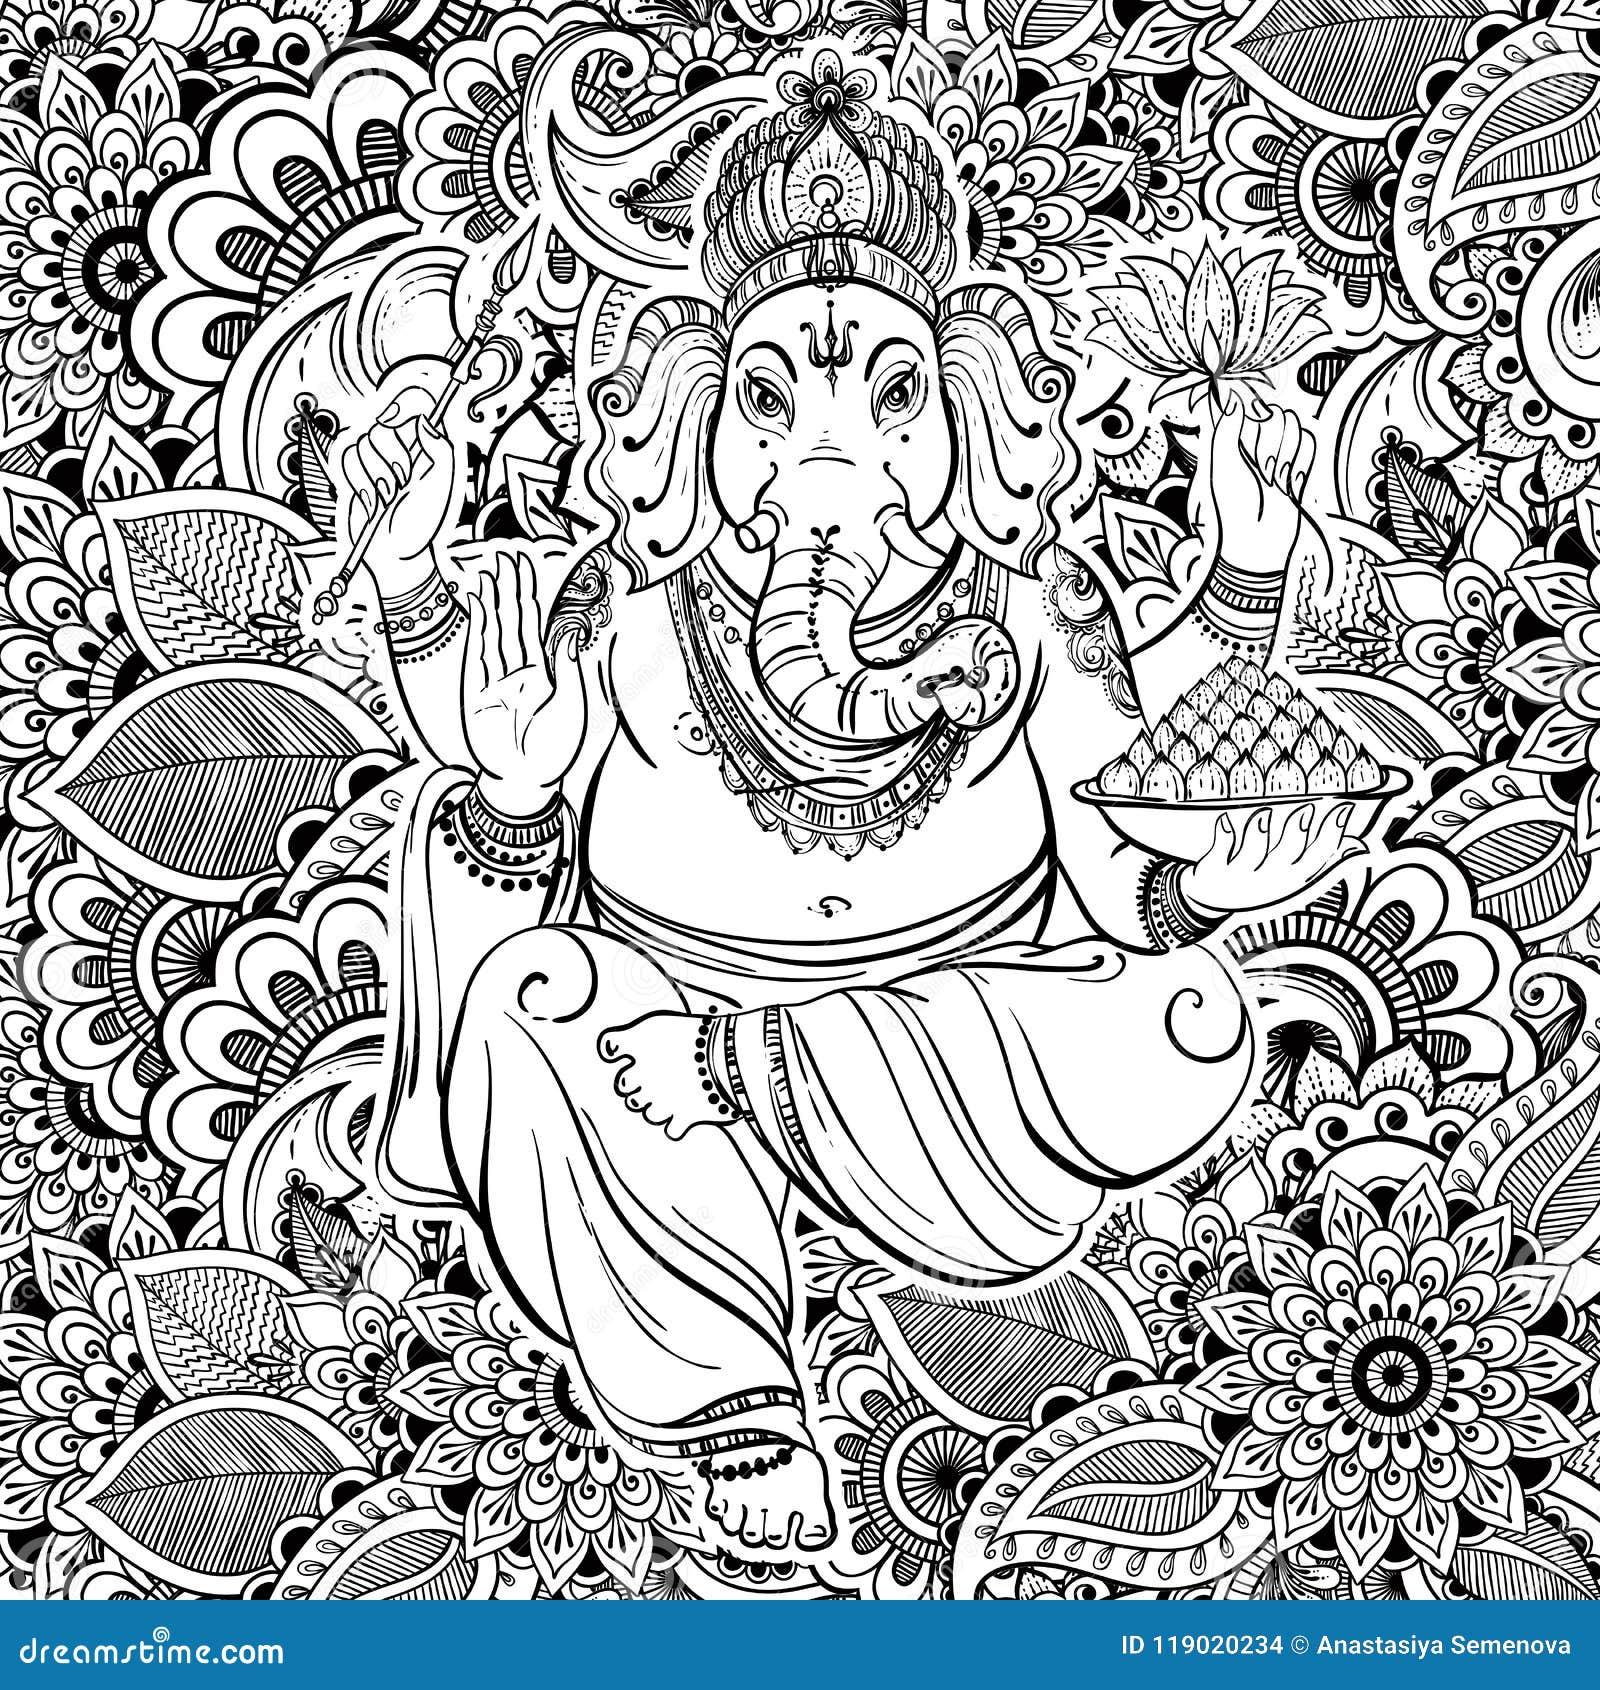 Hindu Lord Ganesha over ornate zentangle pattern. Vector illustration. Hand drawn background zentangle style inspired. Tattoo.